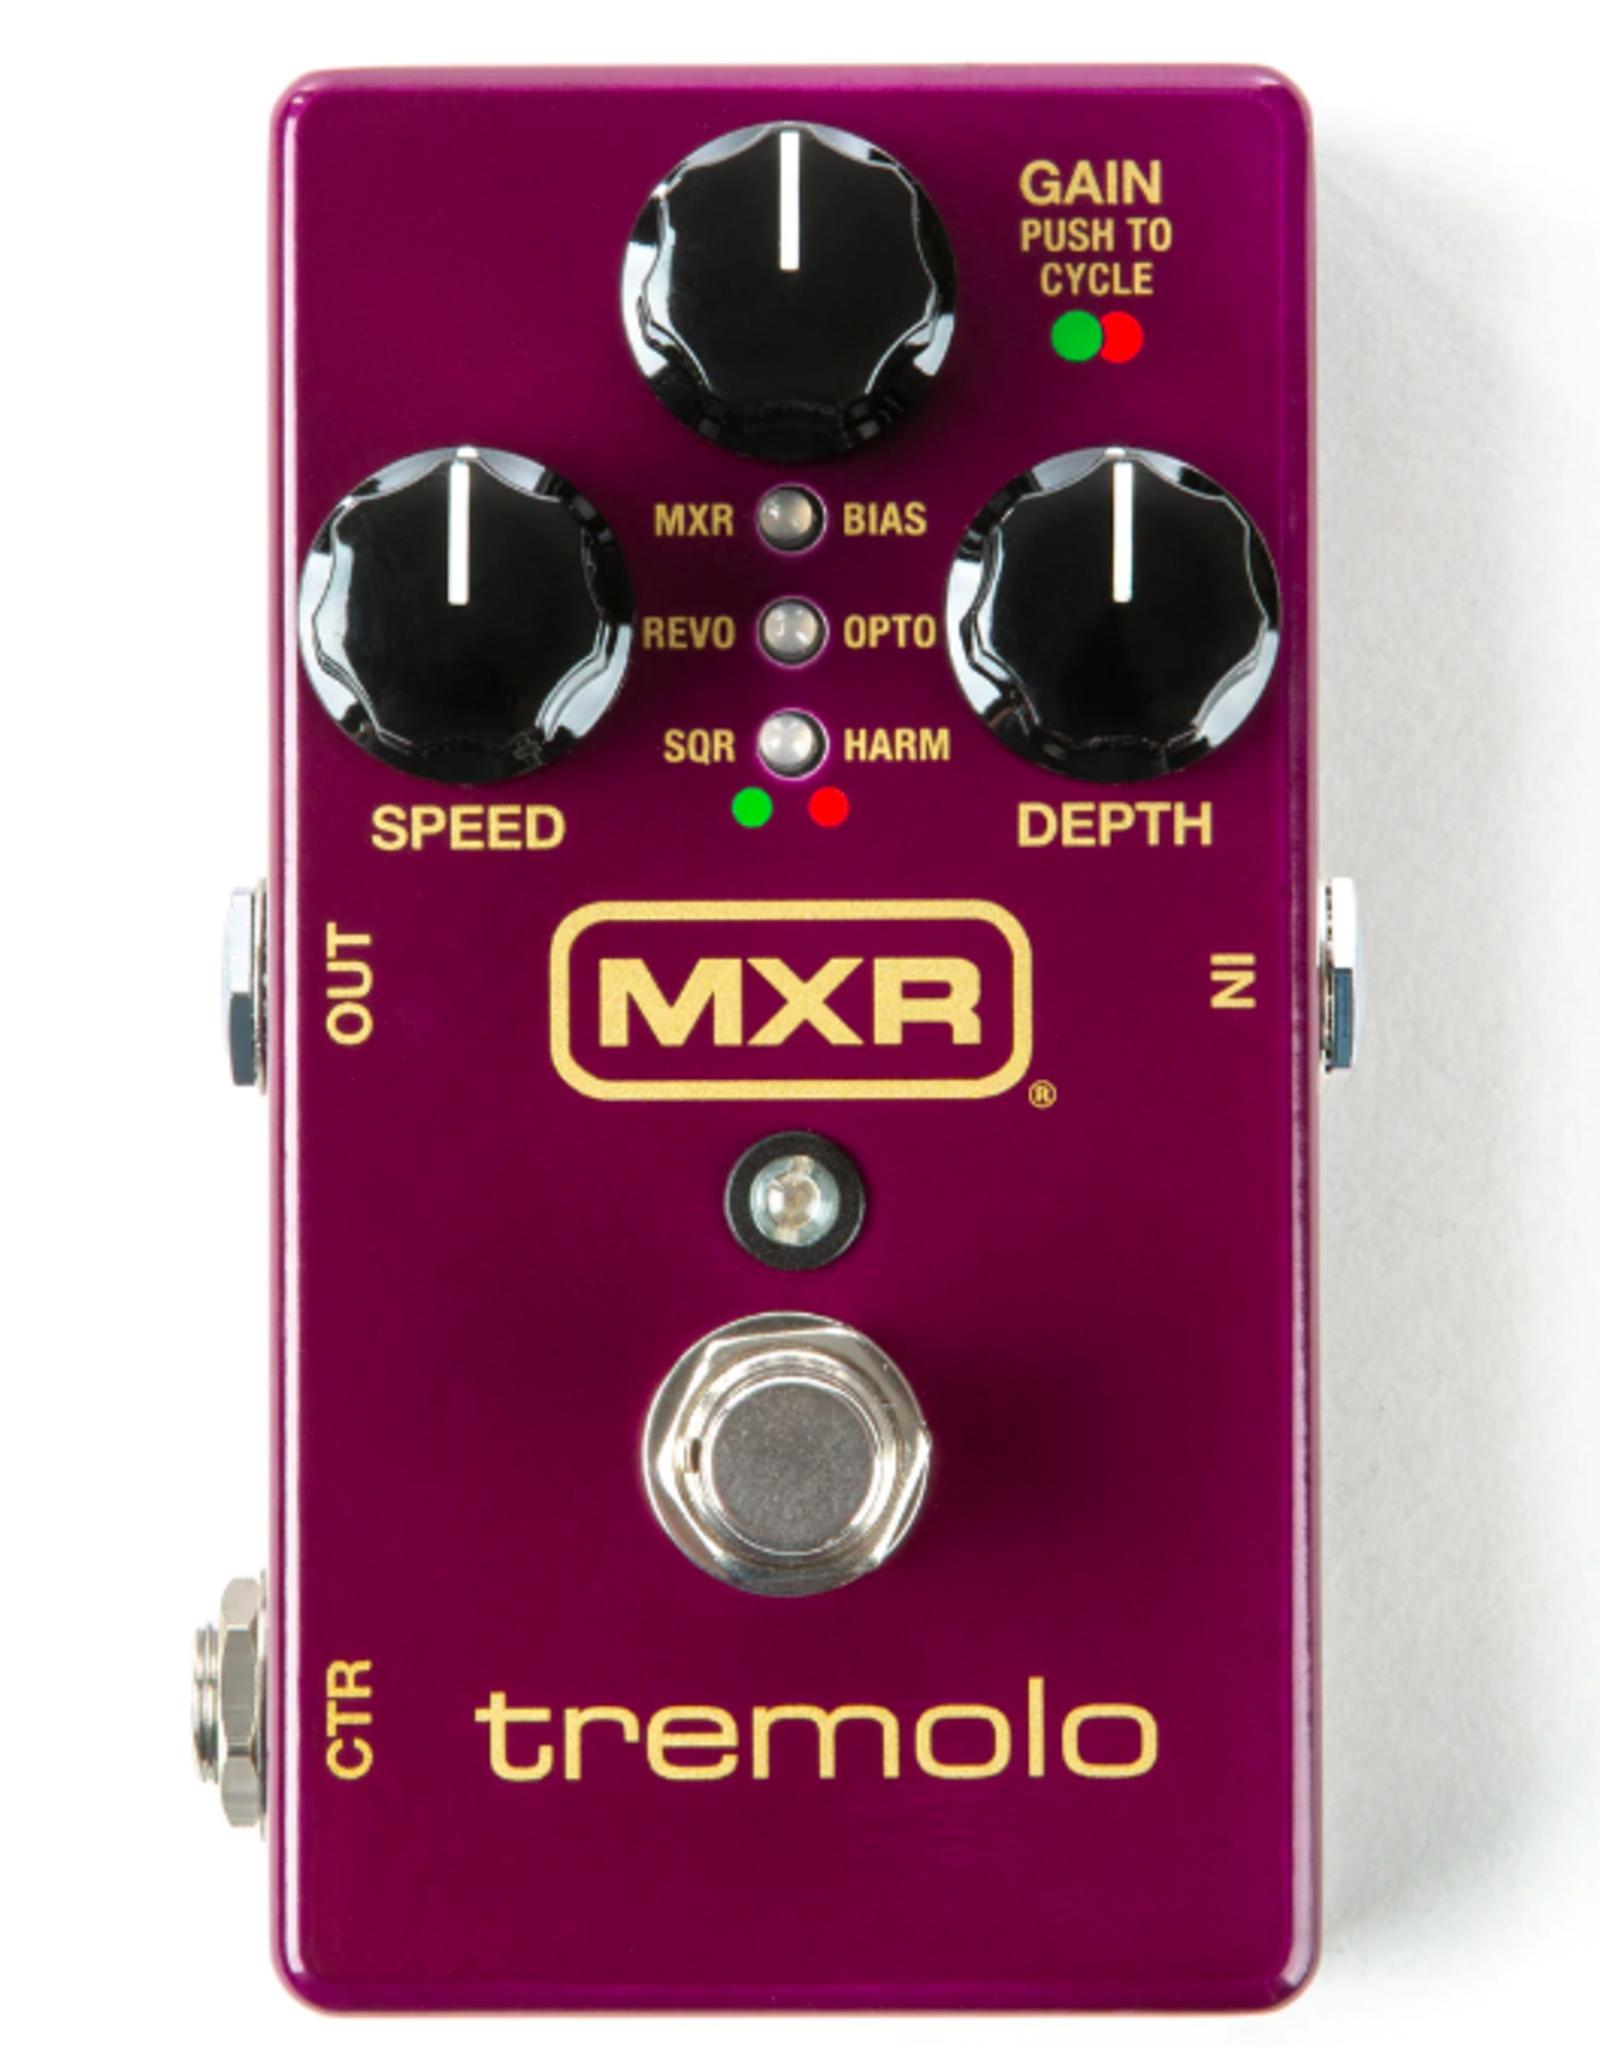 MXR MXR Tremolo